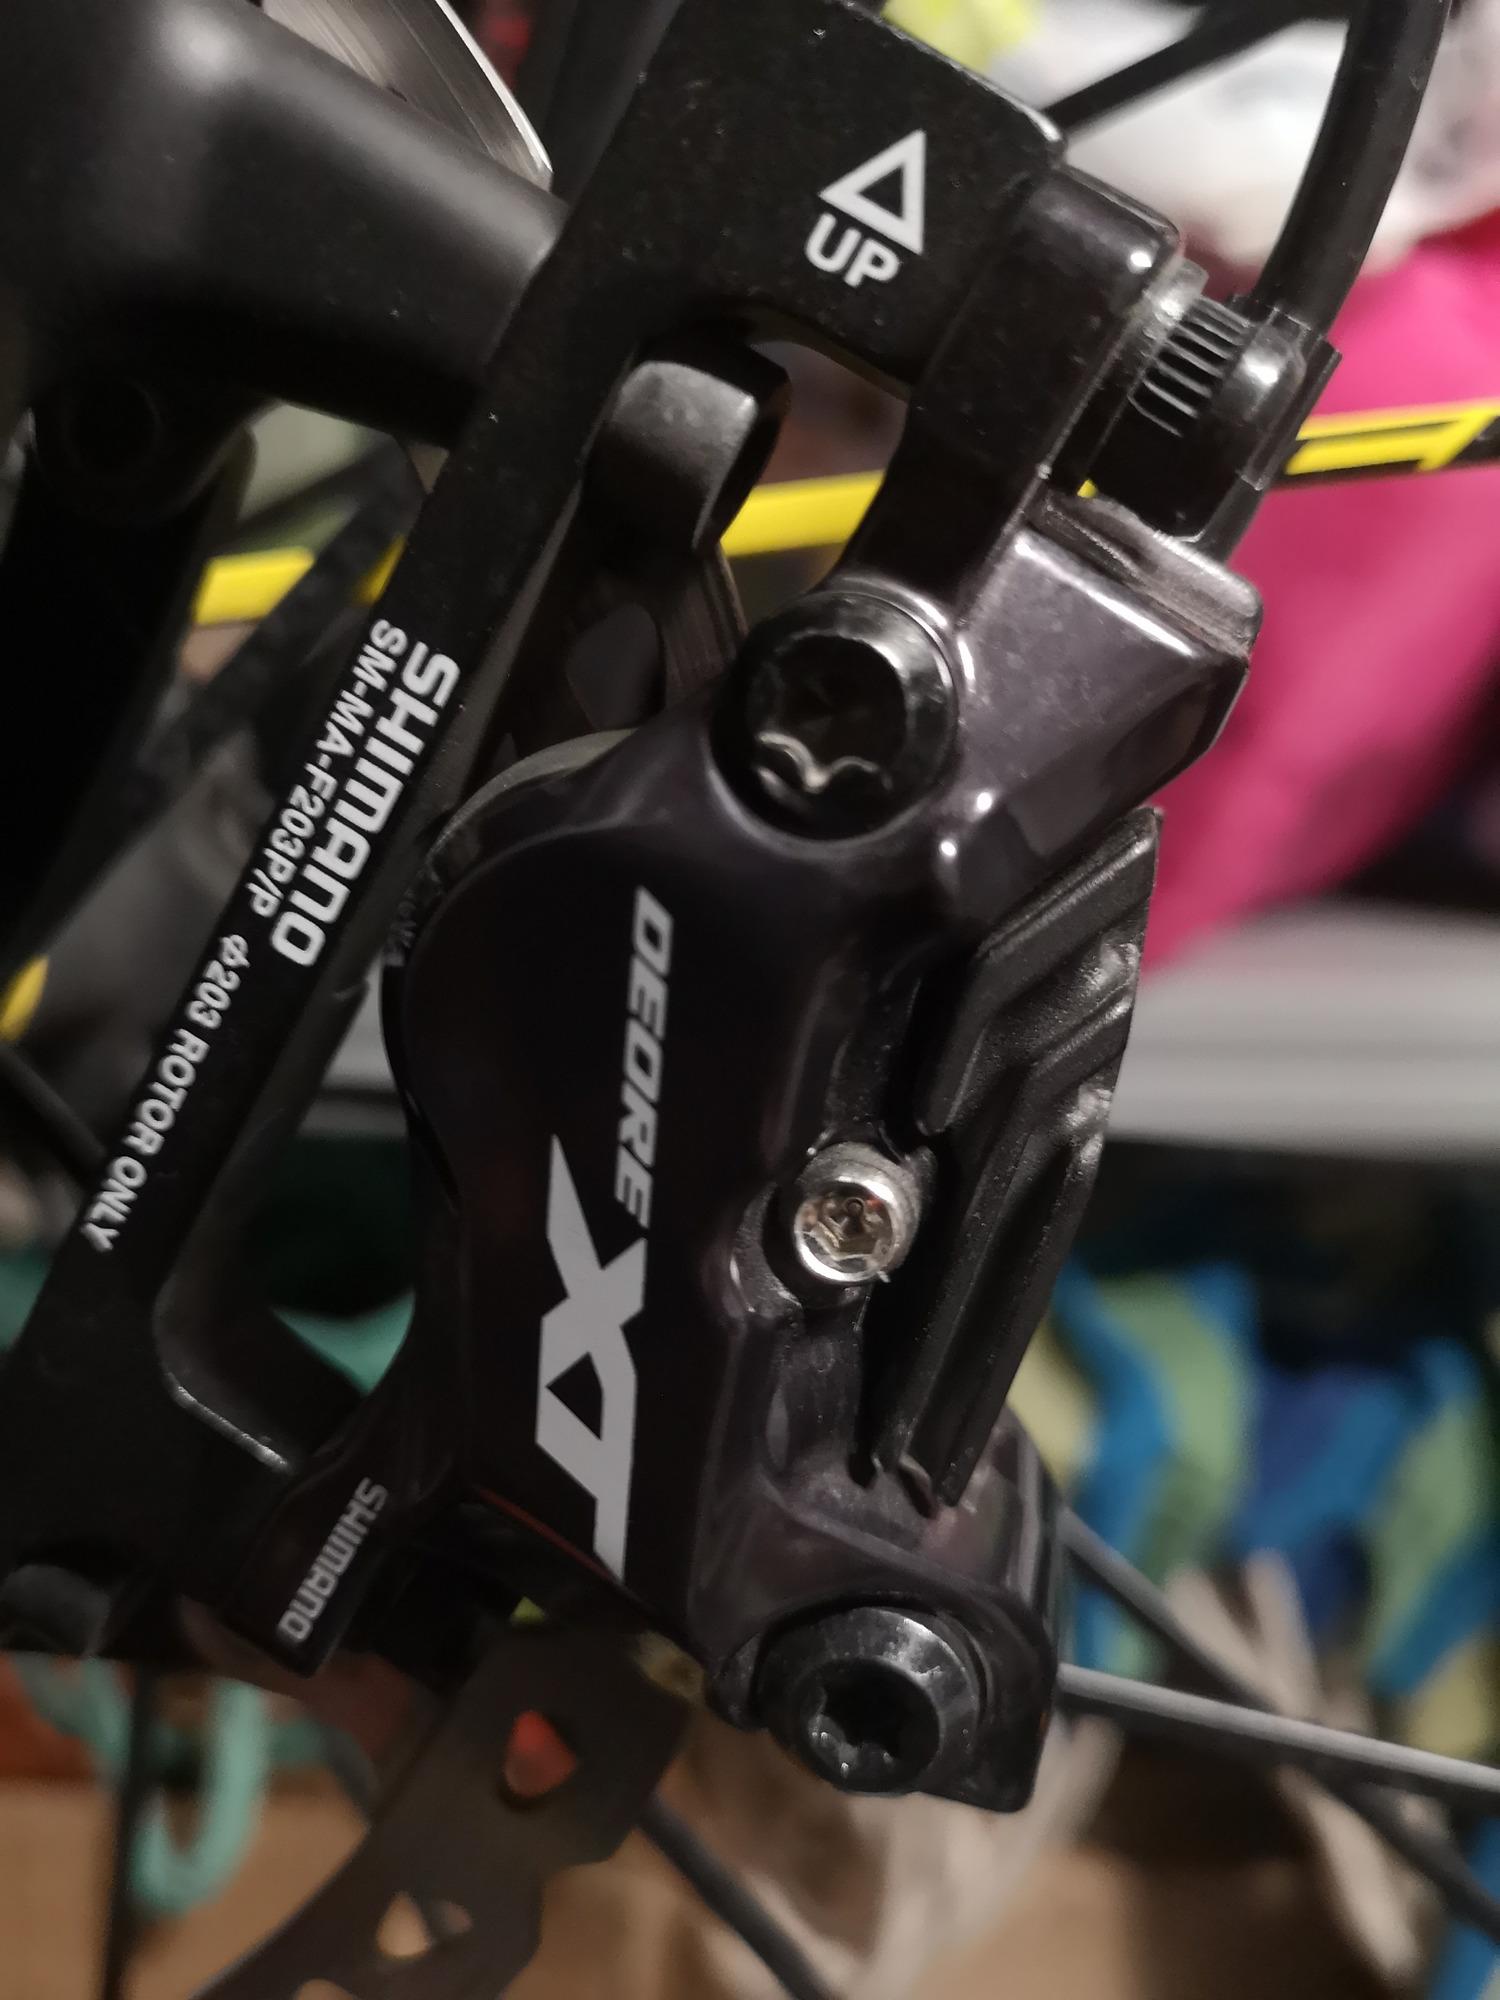 Shimano Xt m8120